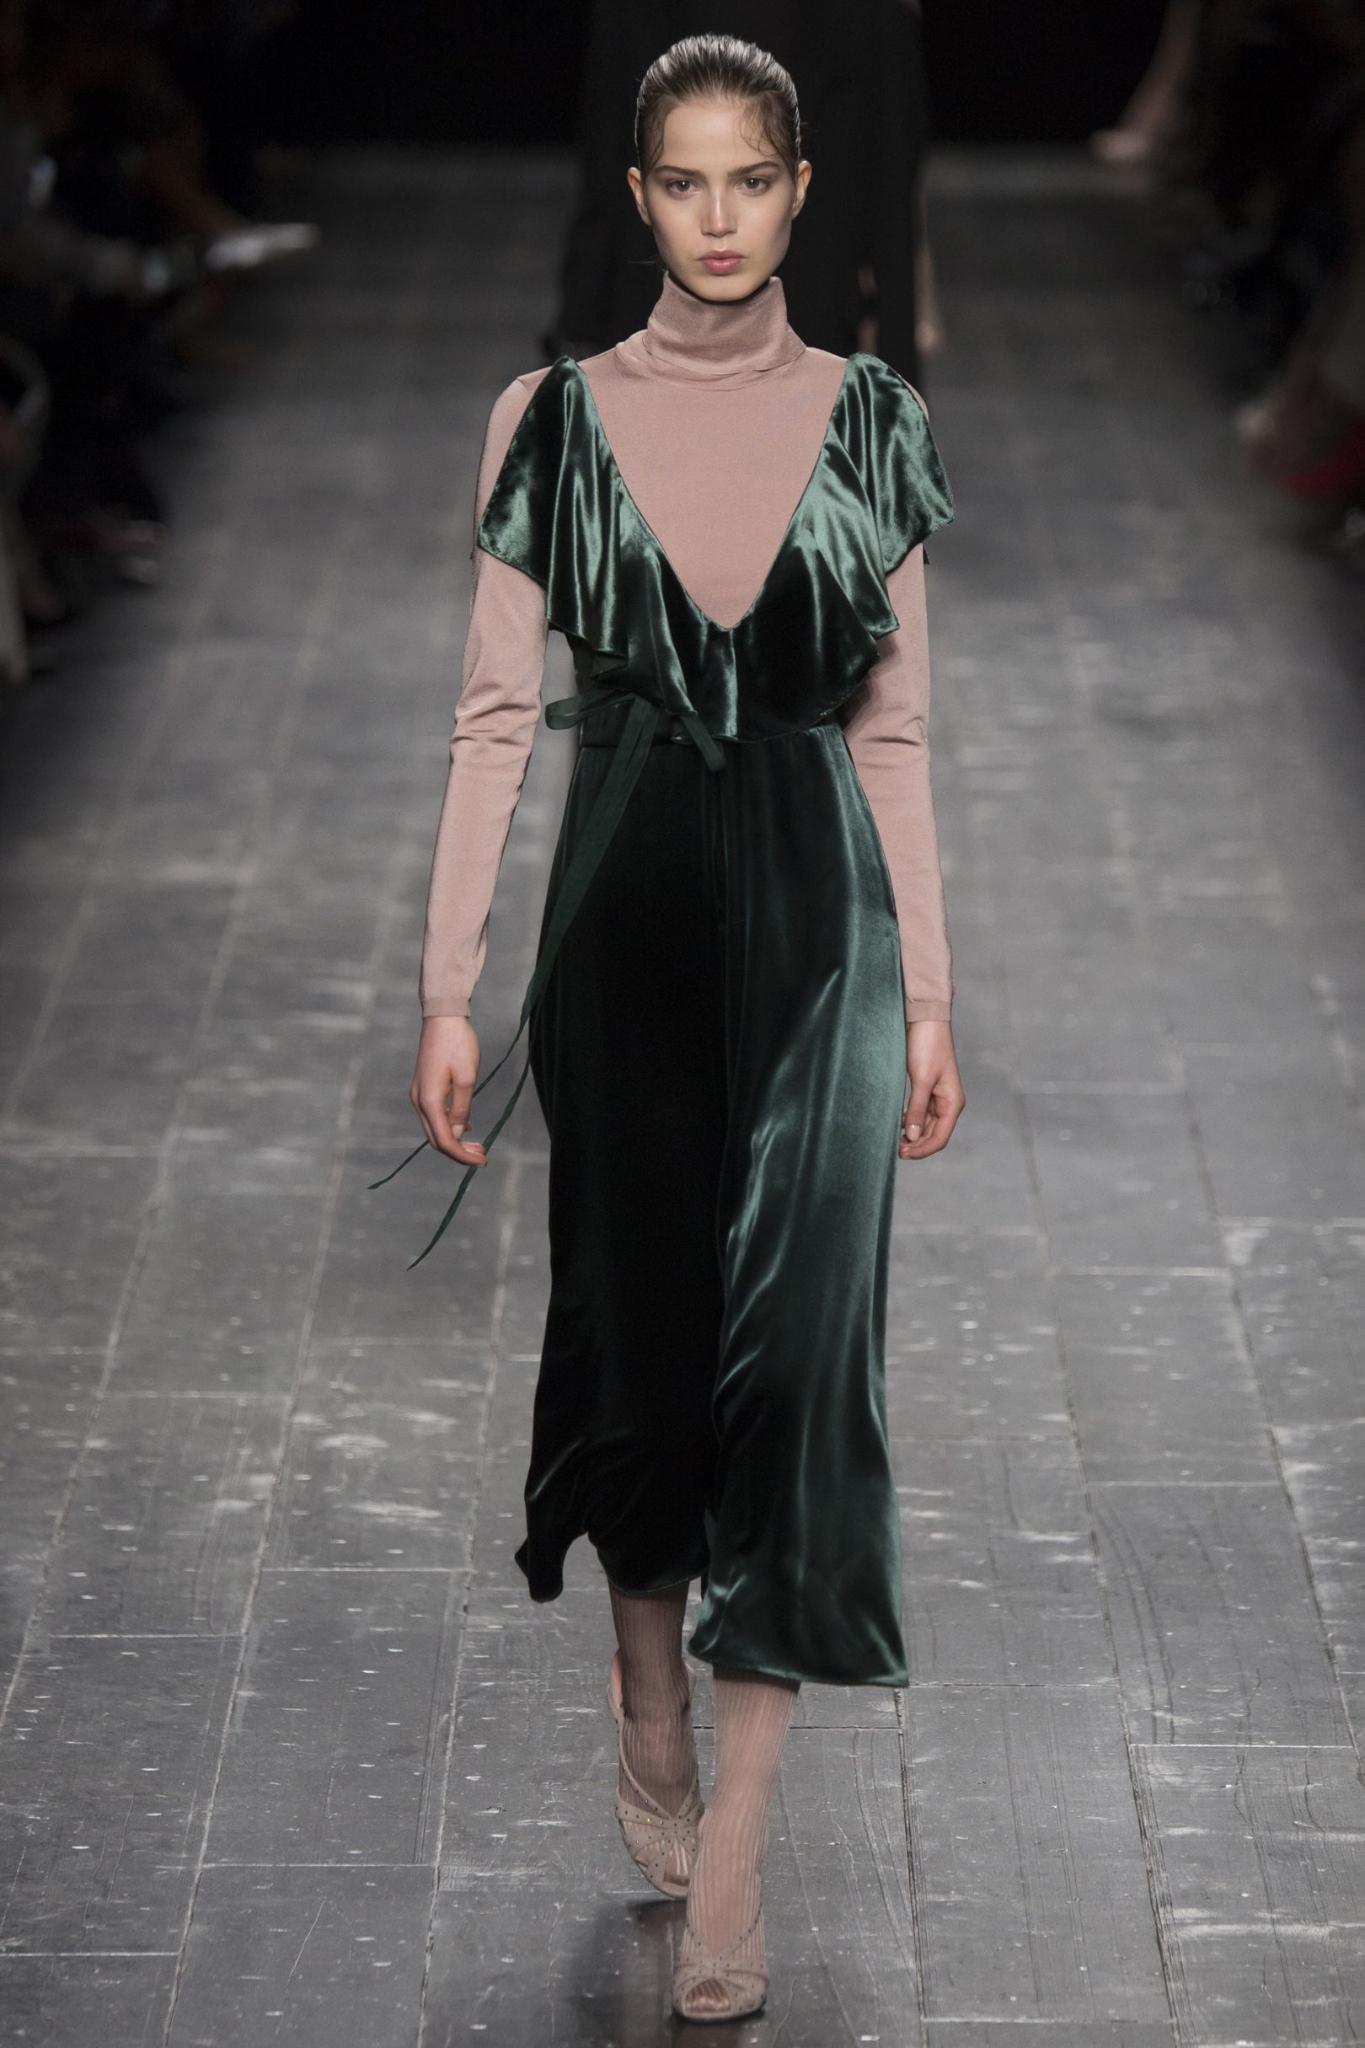 MOD-by-Monique-Fashion-Trend-Velvet-Valentino-2